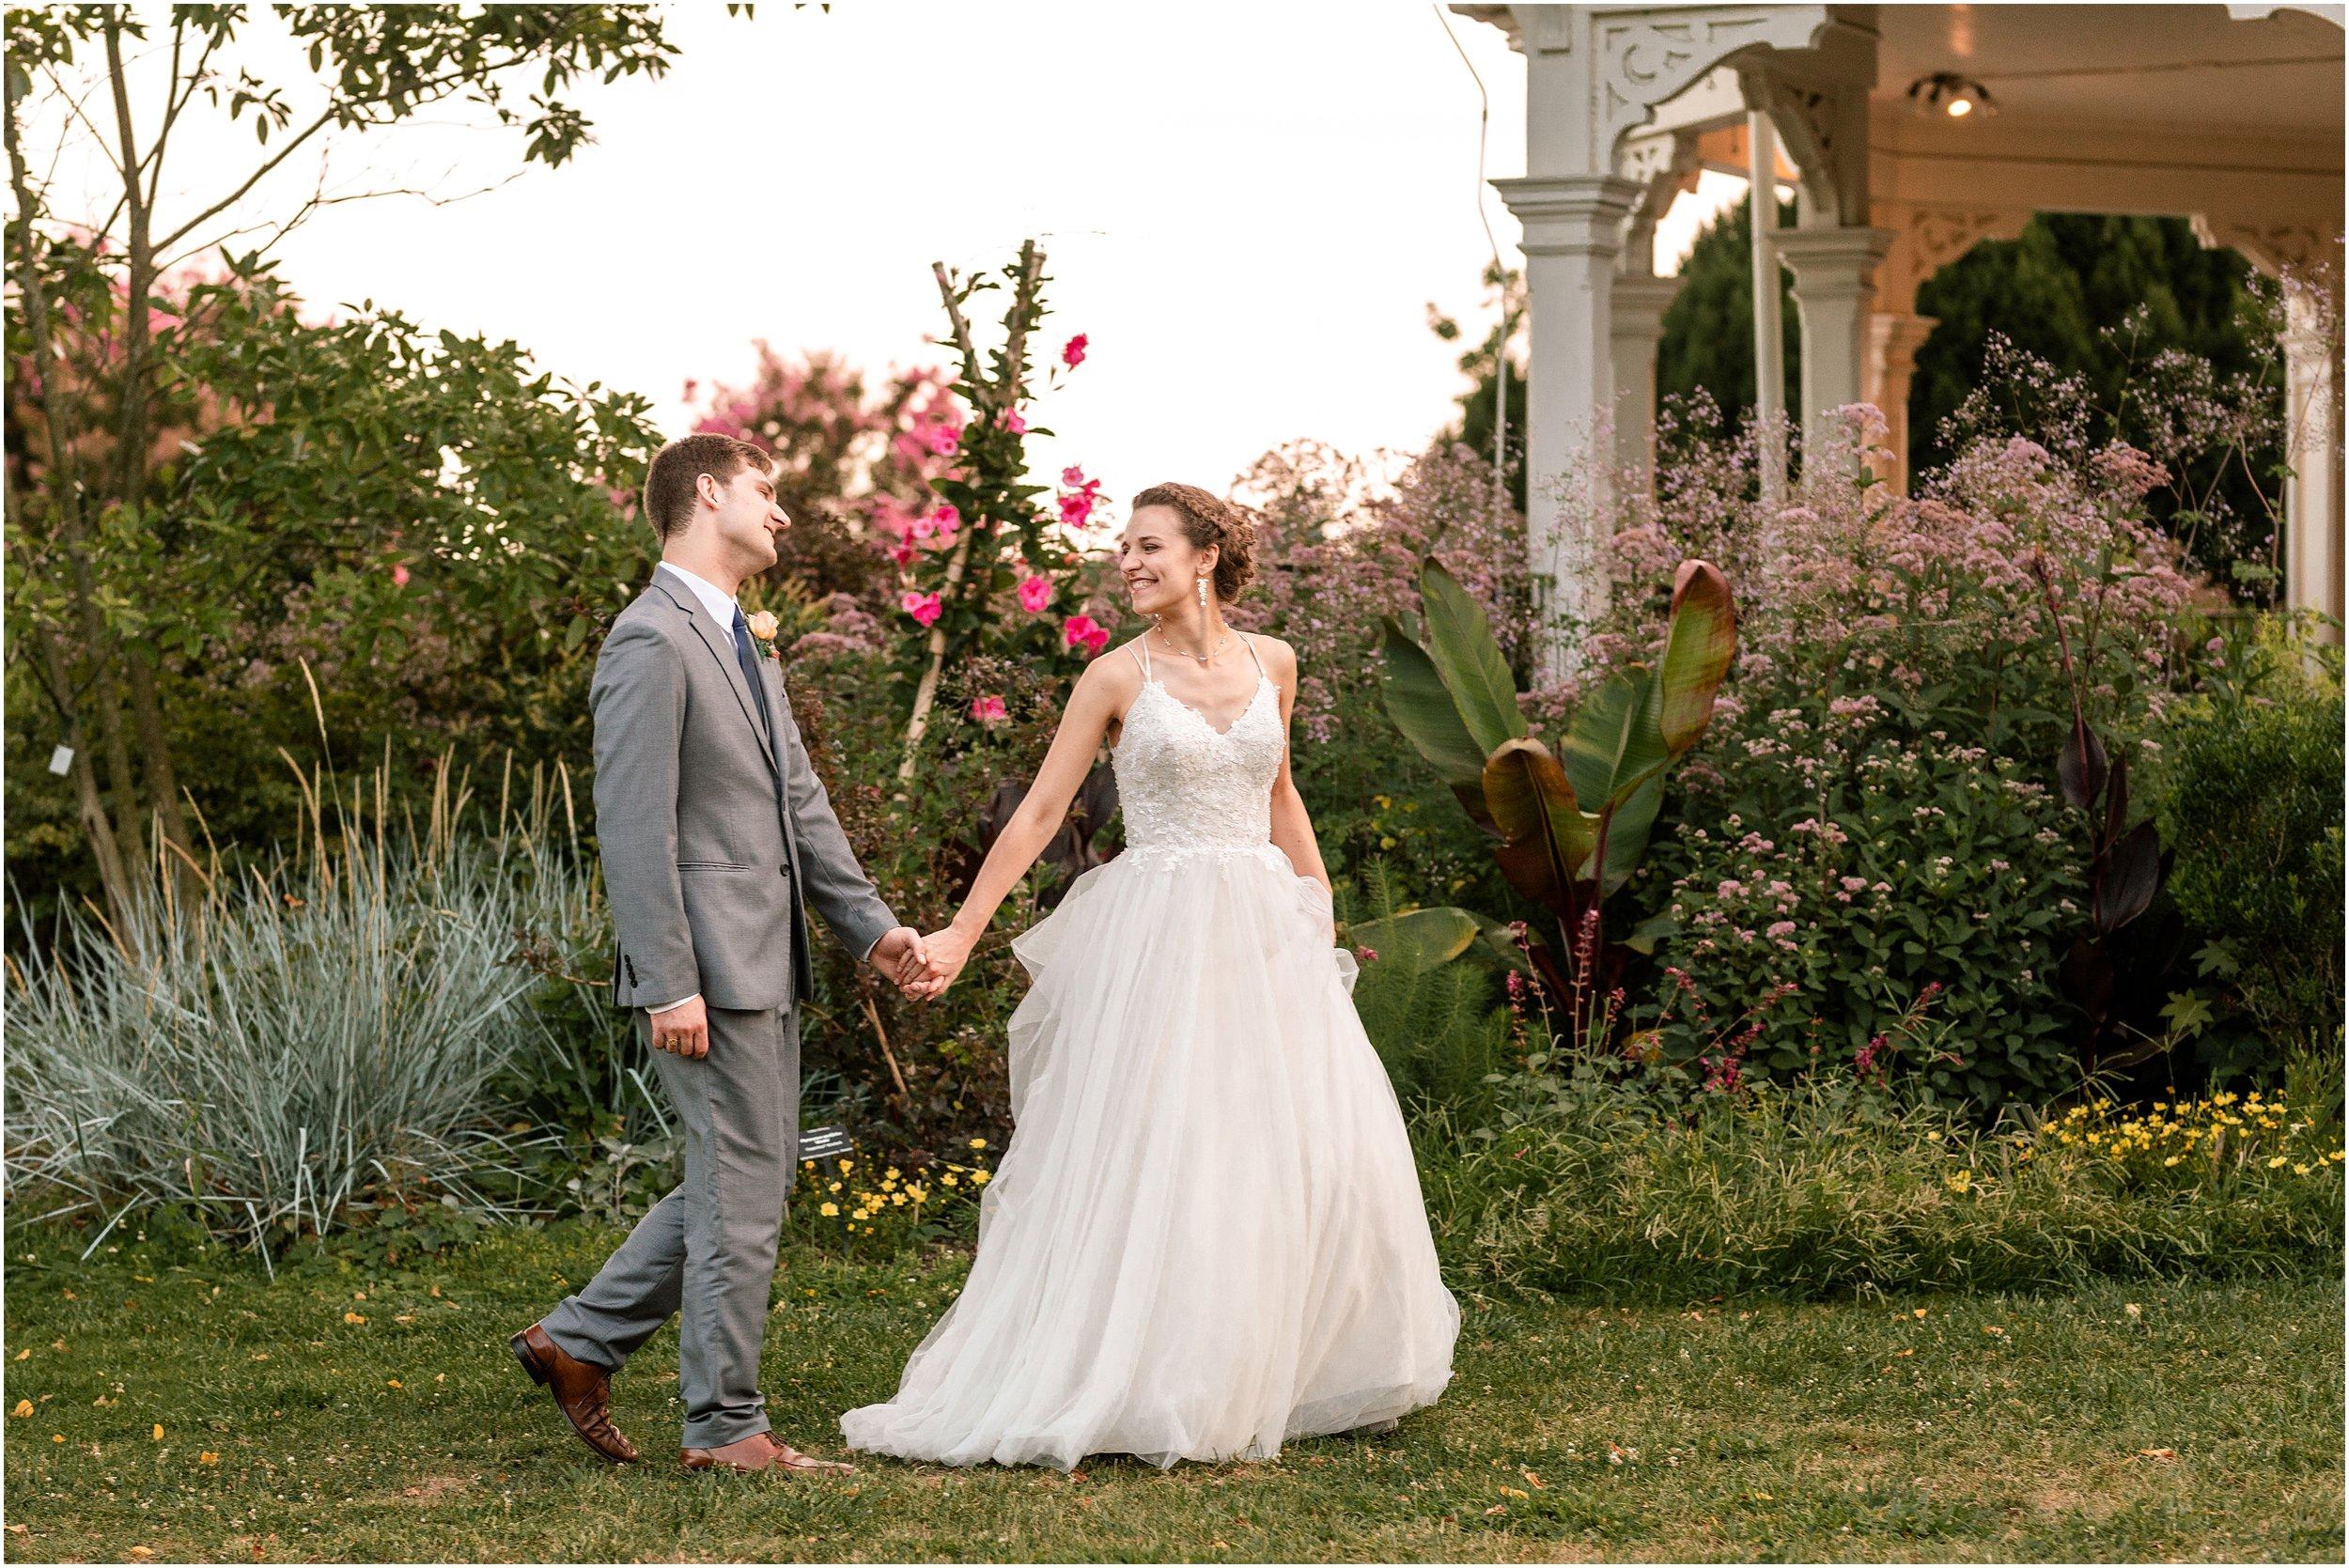 hannah leigh photography Cylburn Arboretum Wedding Baltimore, MD_3465.jpg